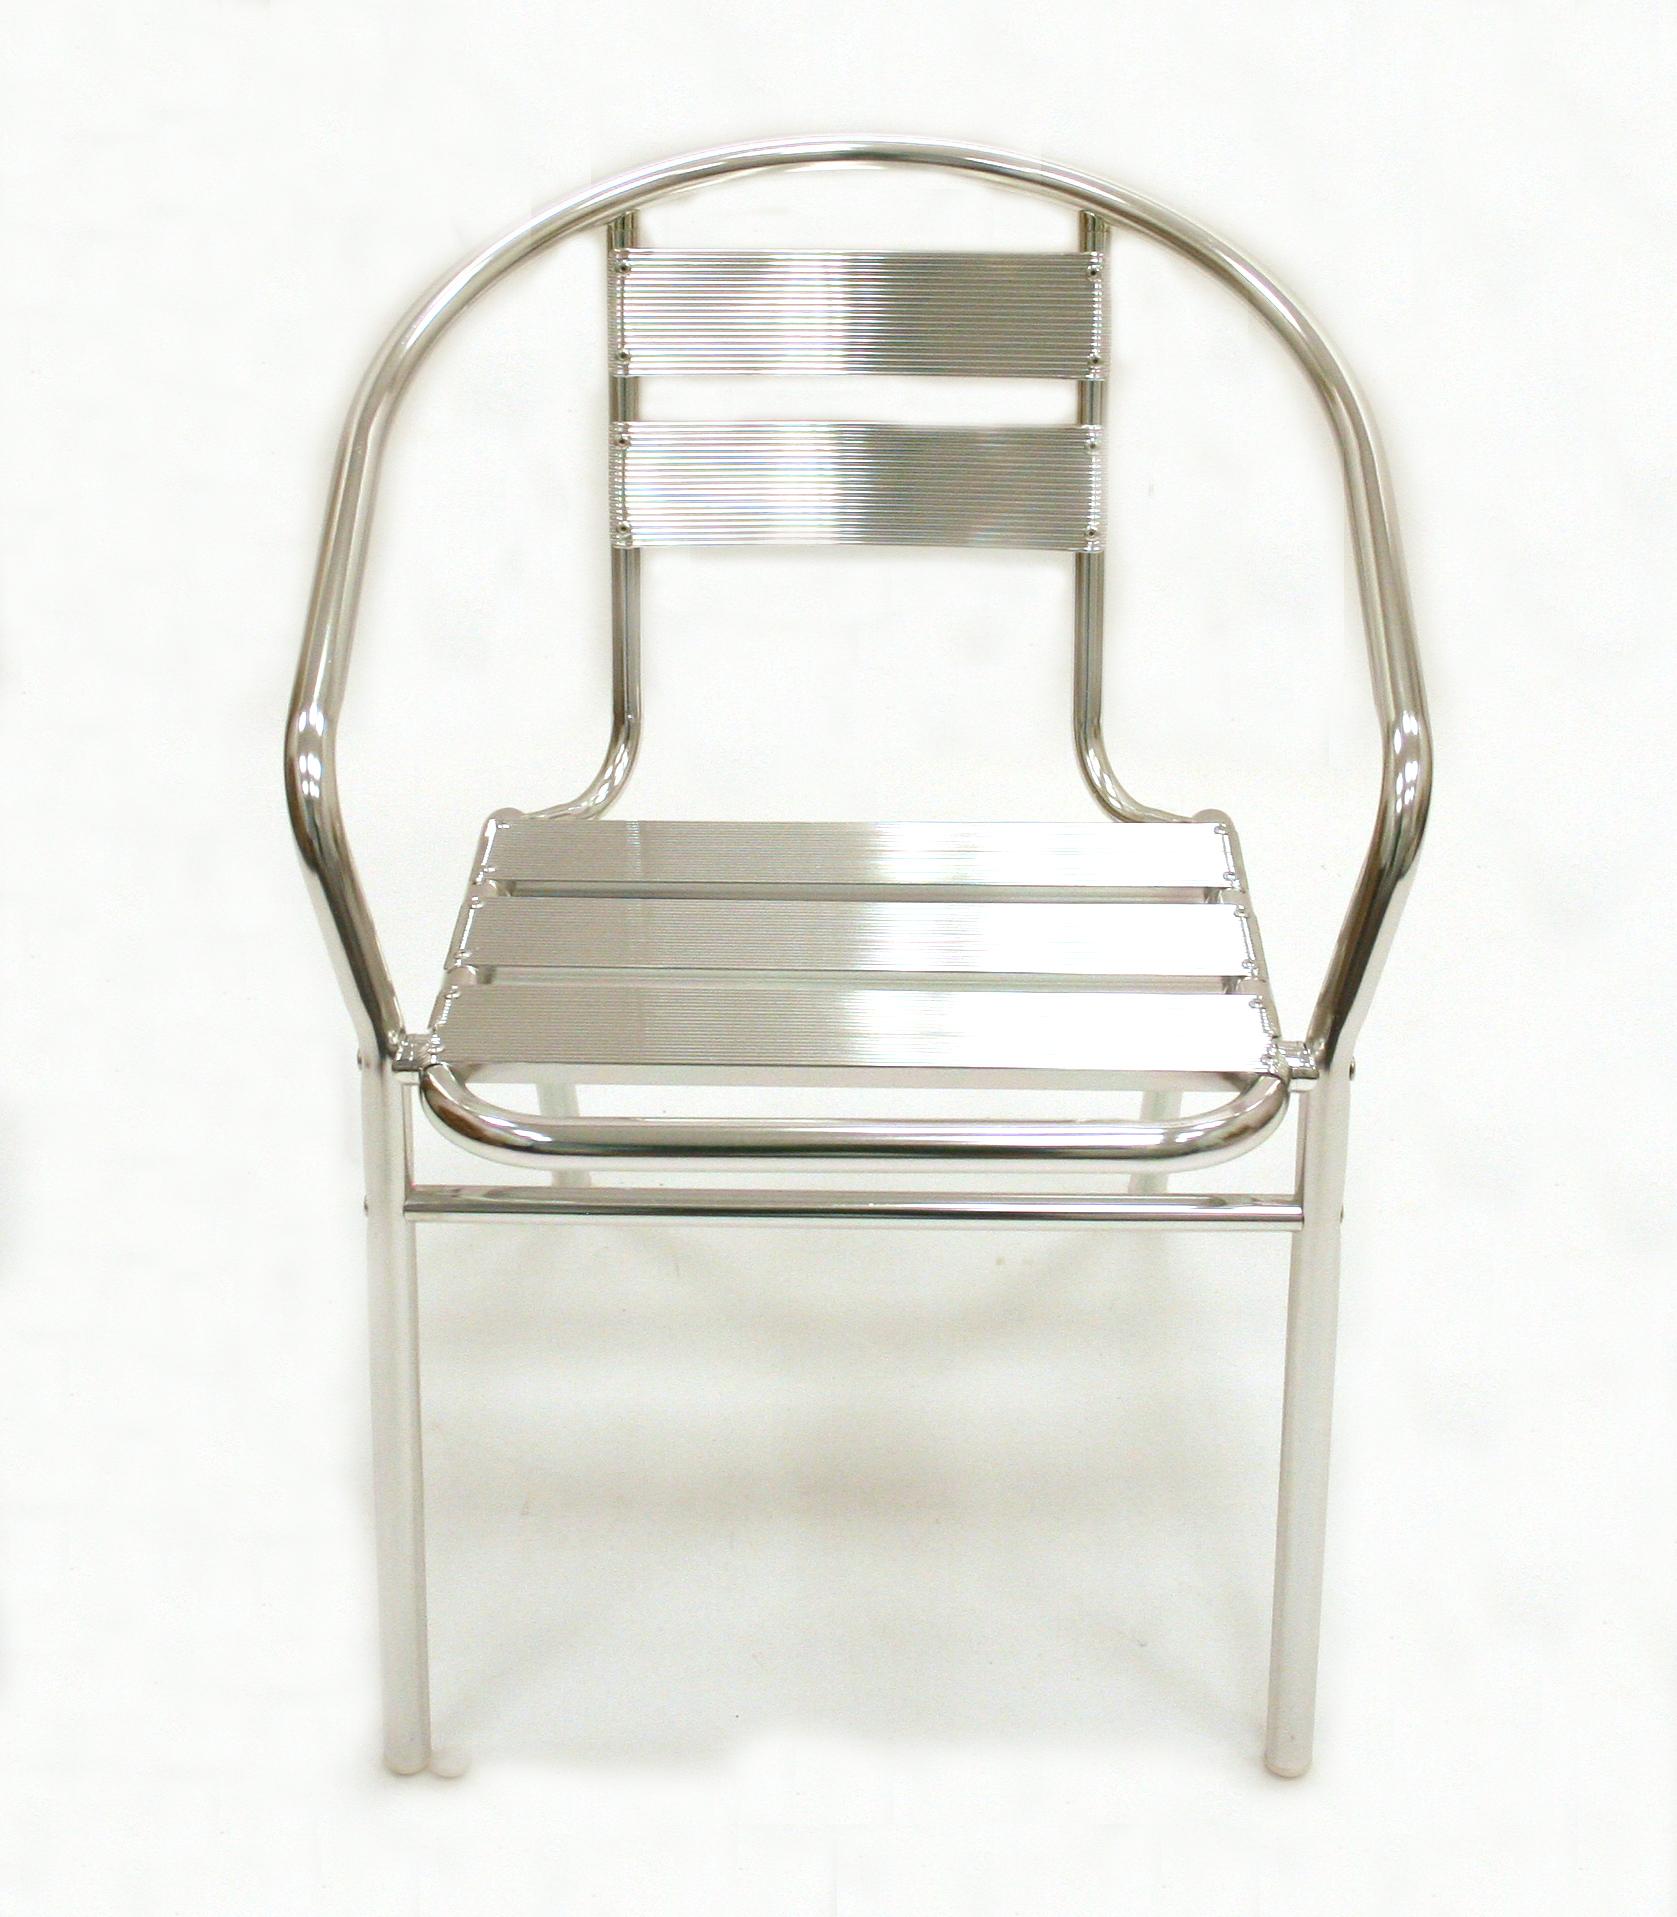 Aluminium Bistro Chair - BE Event Hire